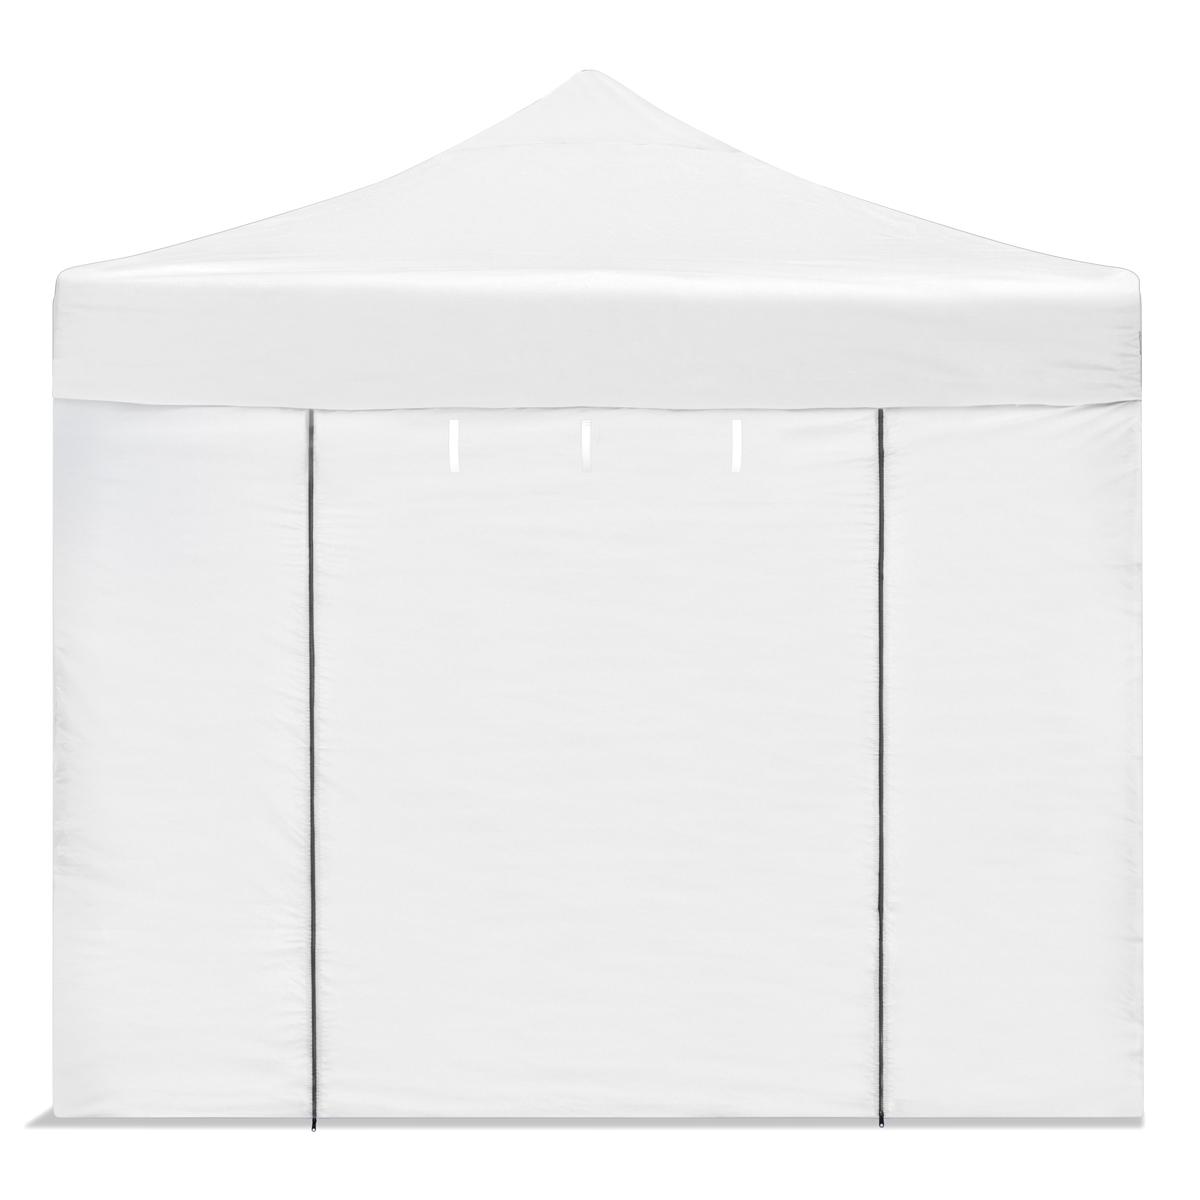 miniatura 11 - Carpa plegable 3x3 impermeable, carpas para exteriores, jardin o terraza